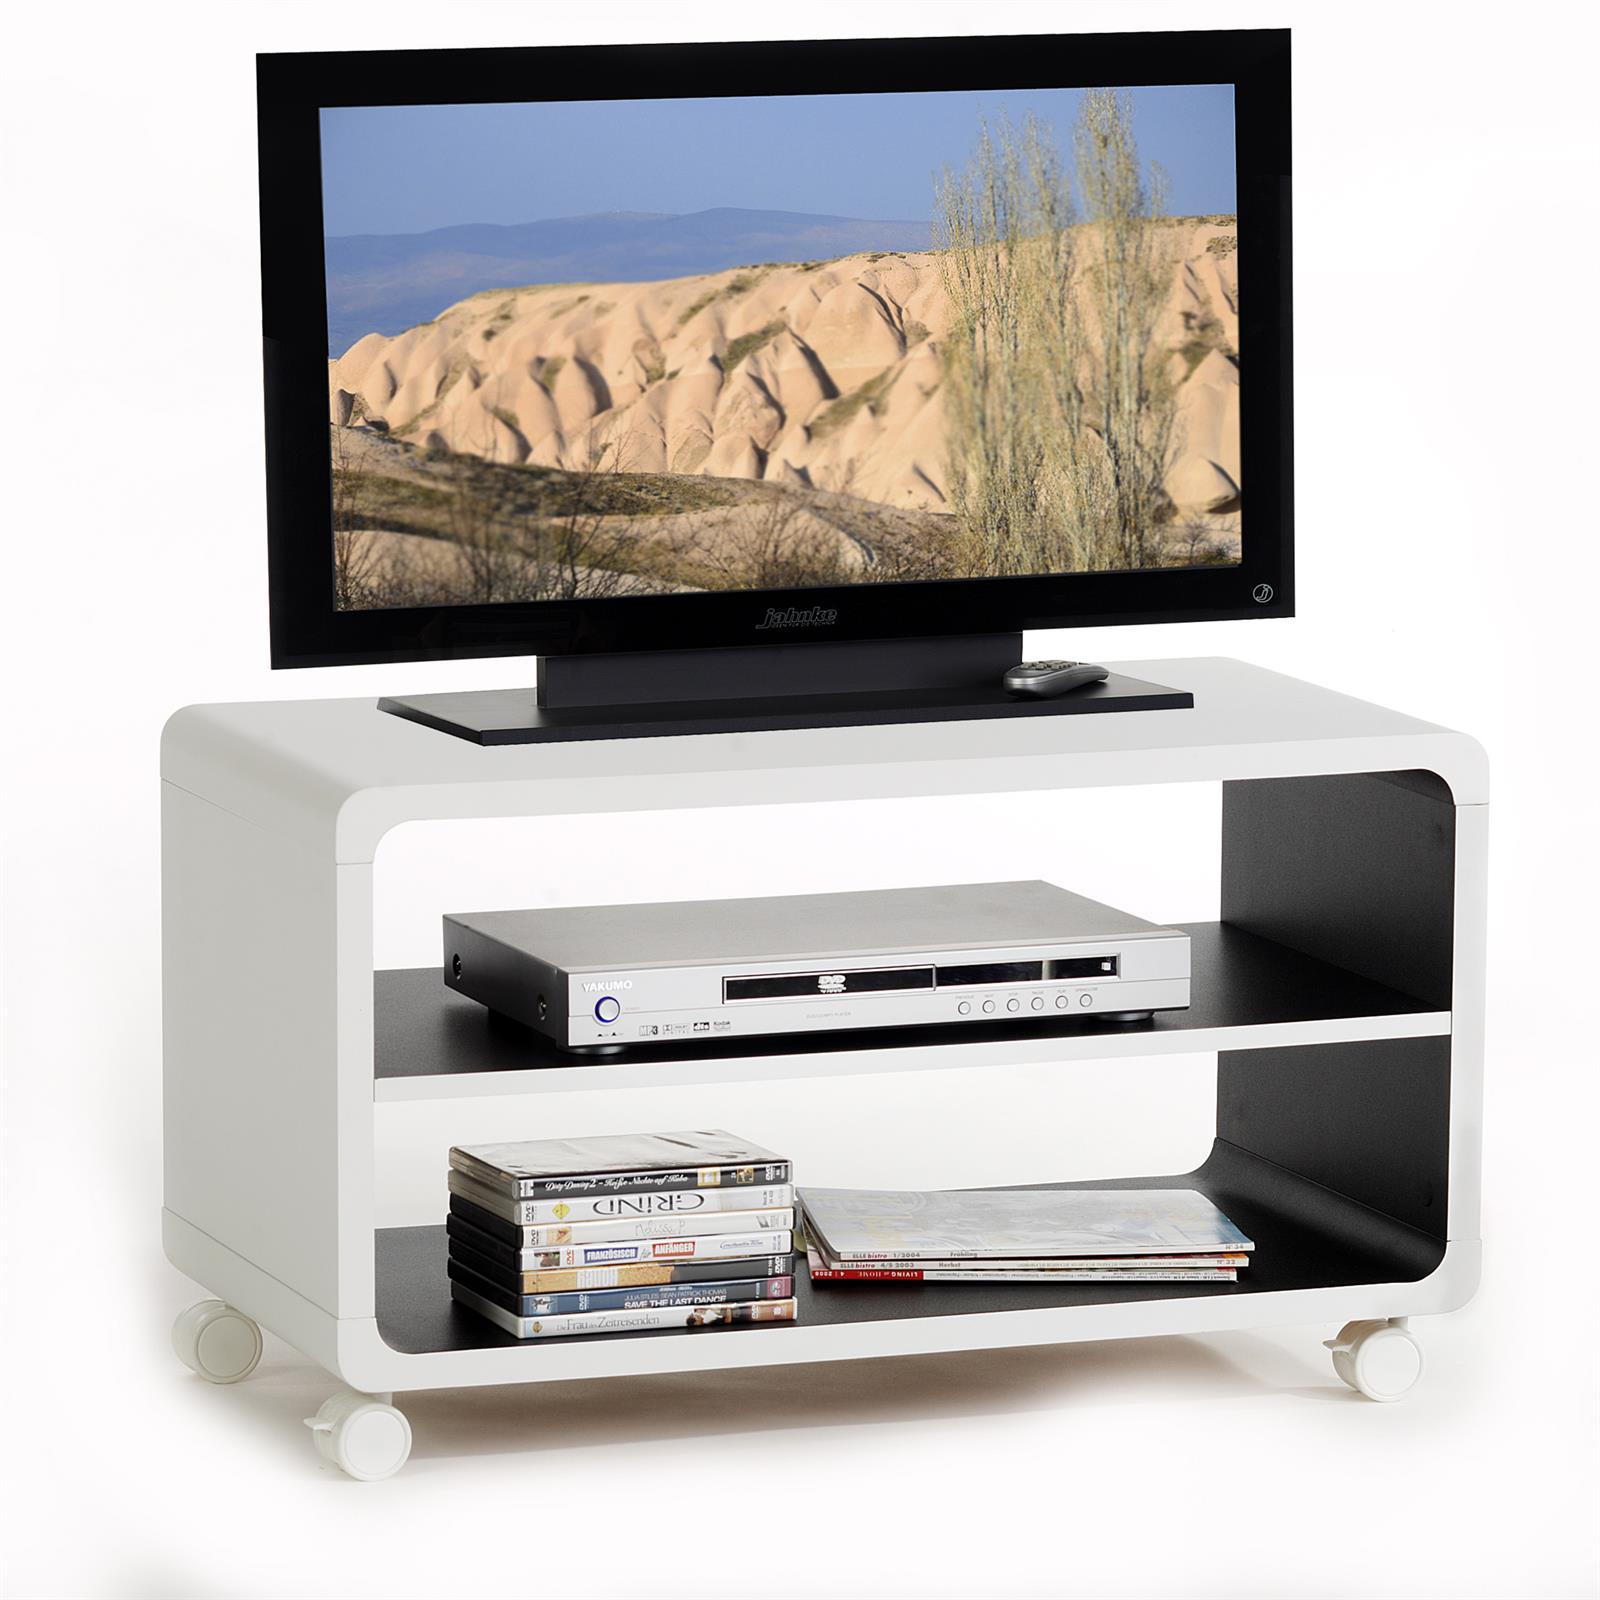 tv rack miami in wei schwarz mobilia24. Black Bedroom Furniture Sets. Home Design Ideas